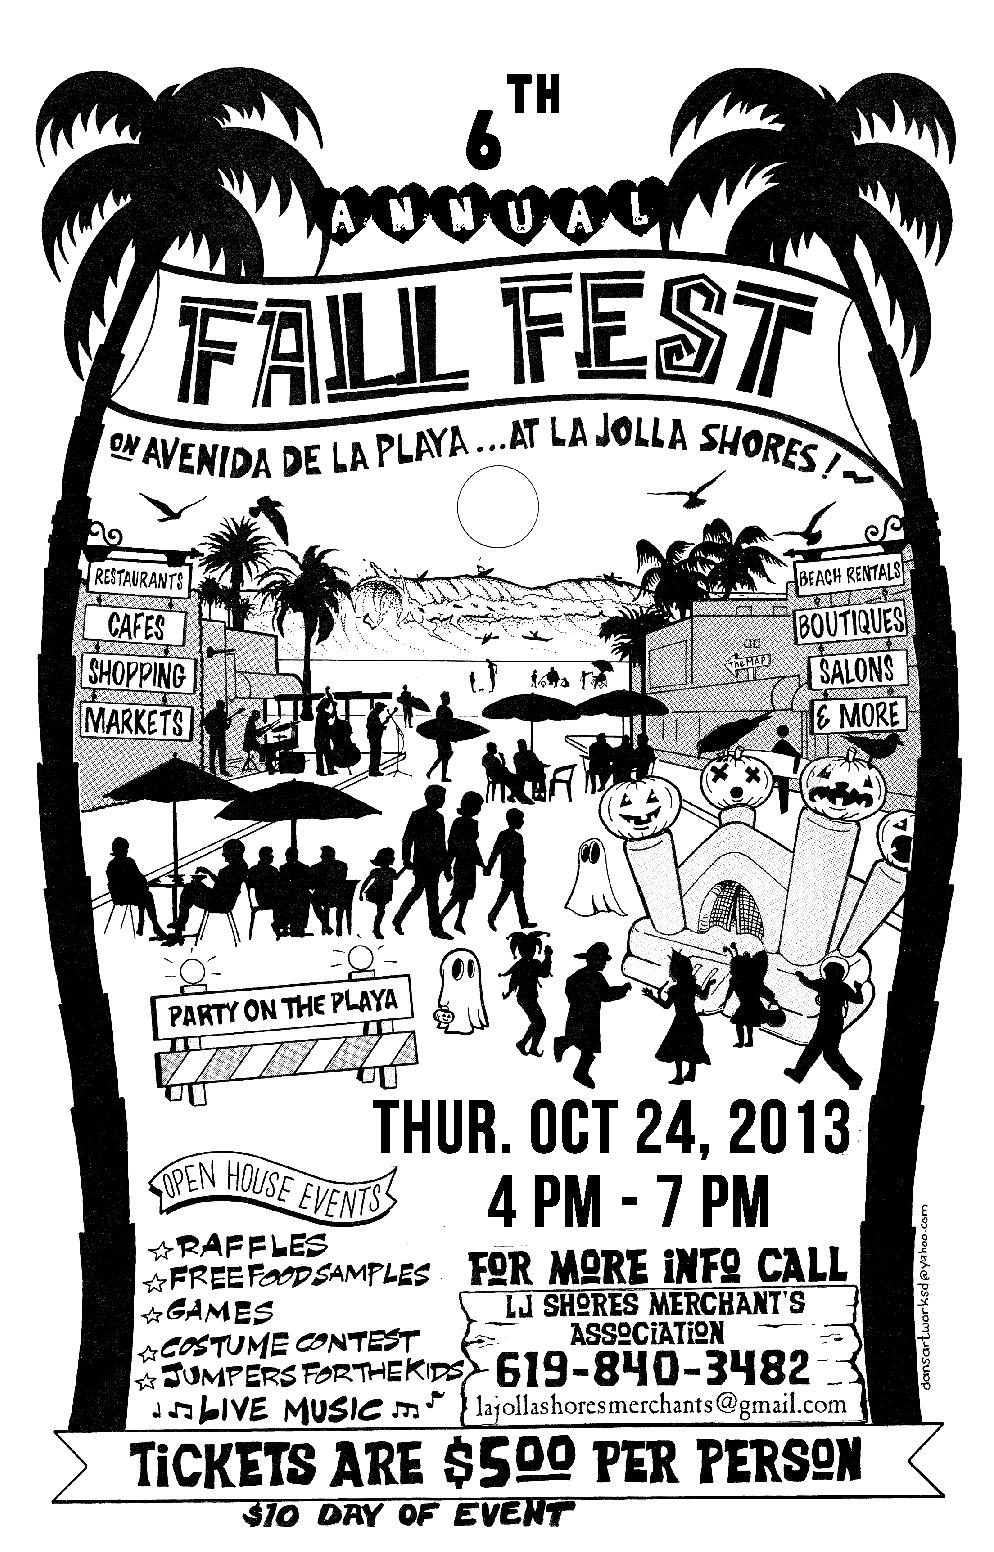 La Jolla Shores Fall Festival 2013 San Diego